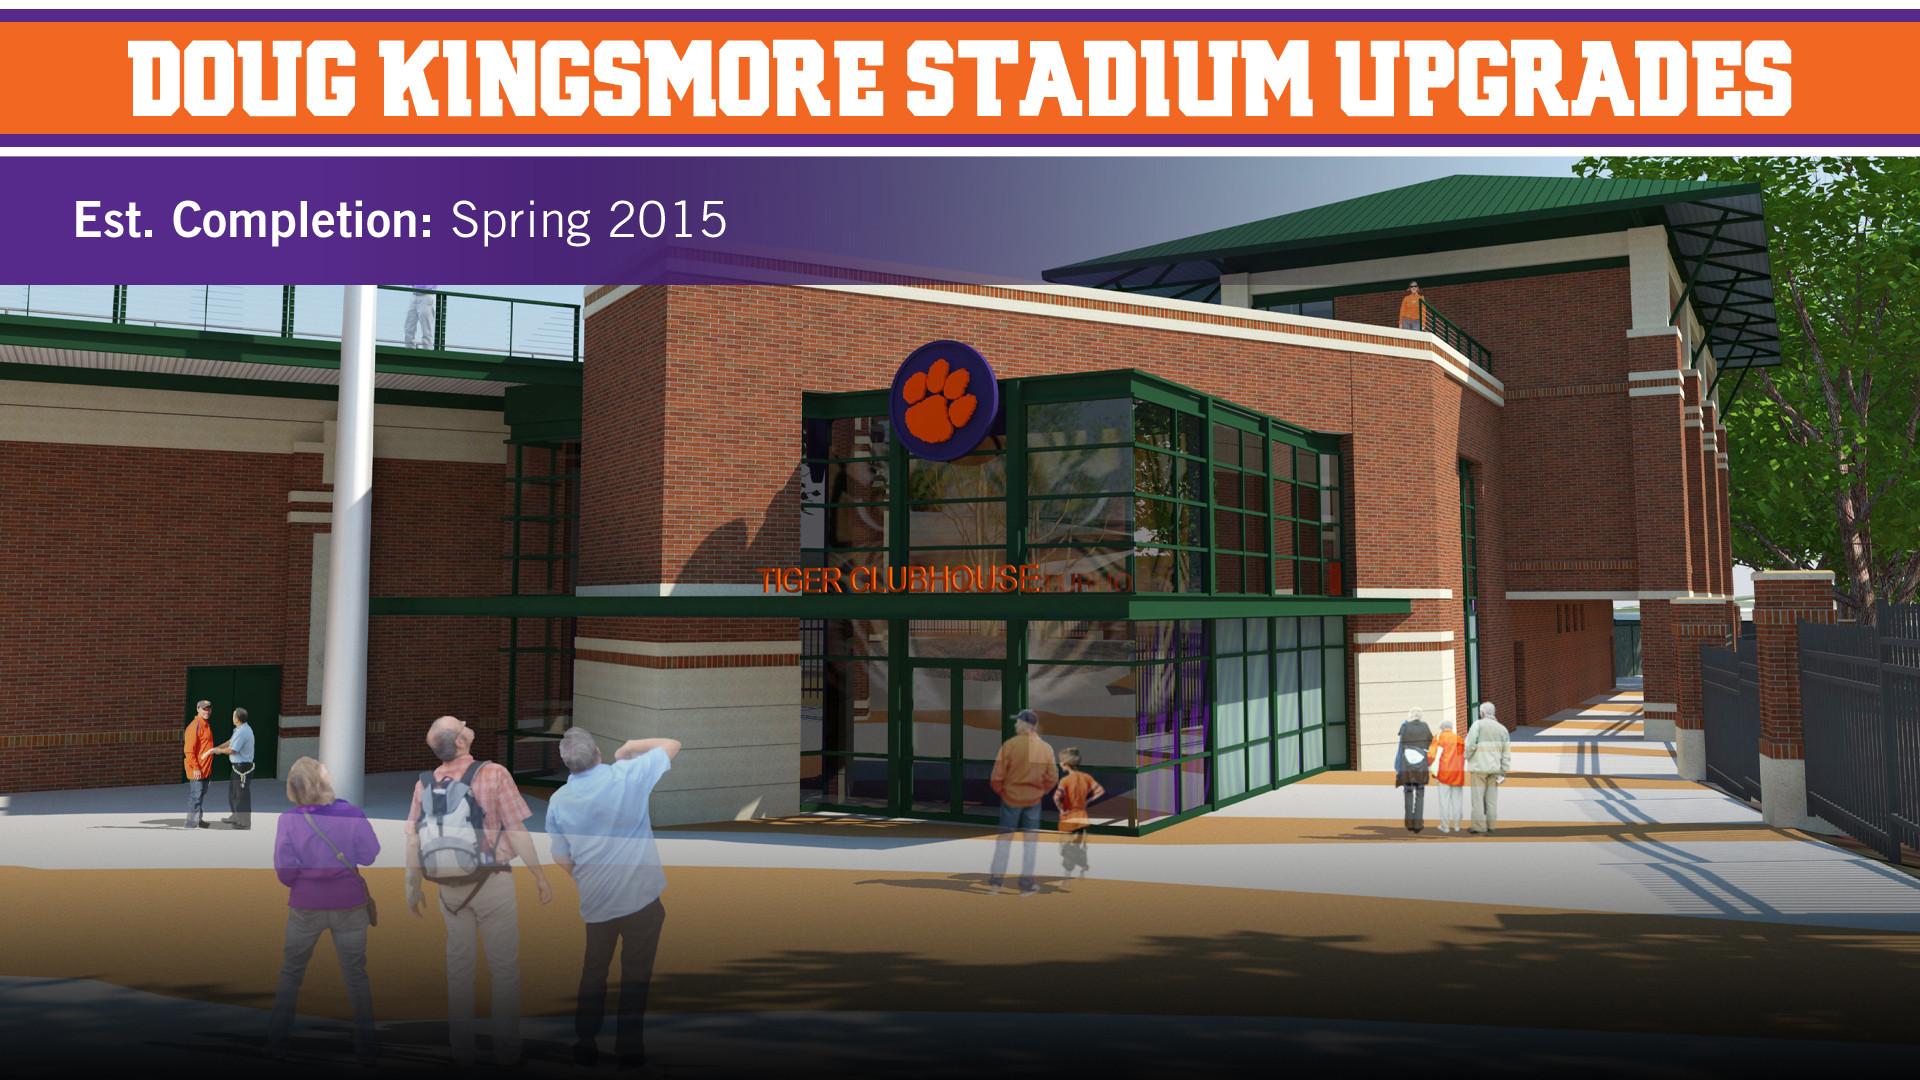 Doug Kingsmore Stadium Upgrades